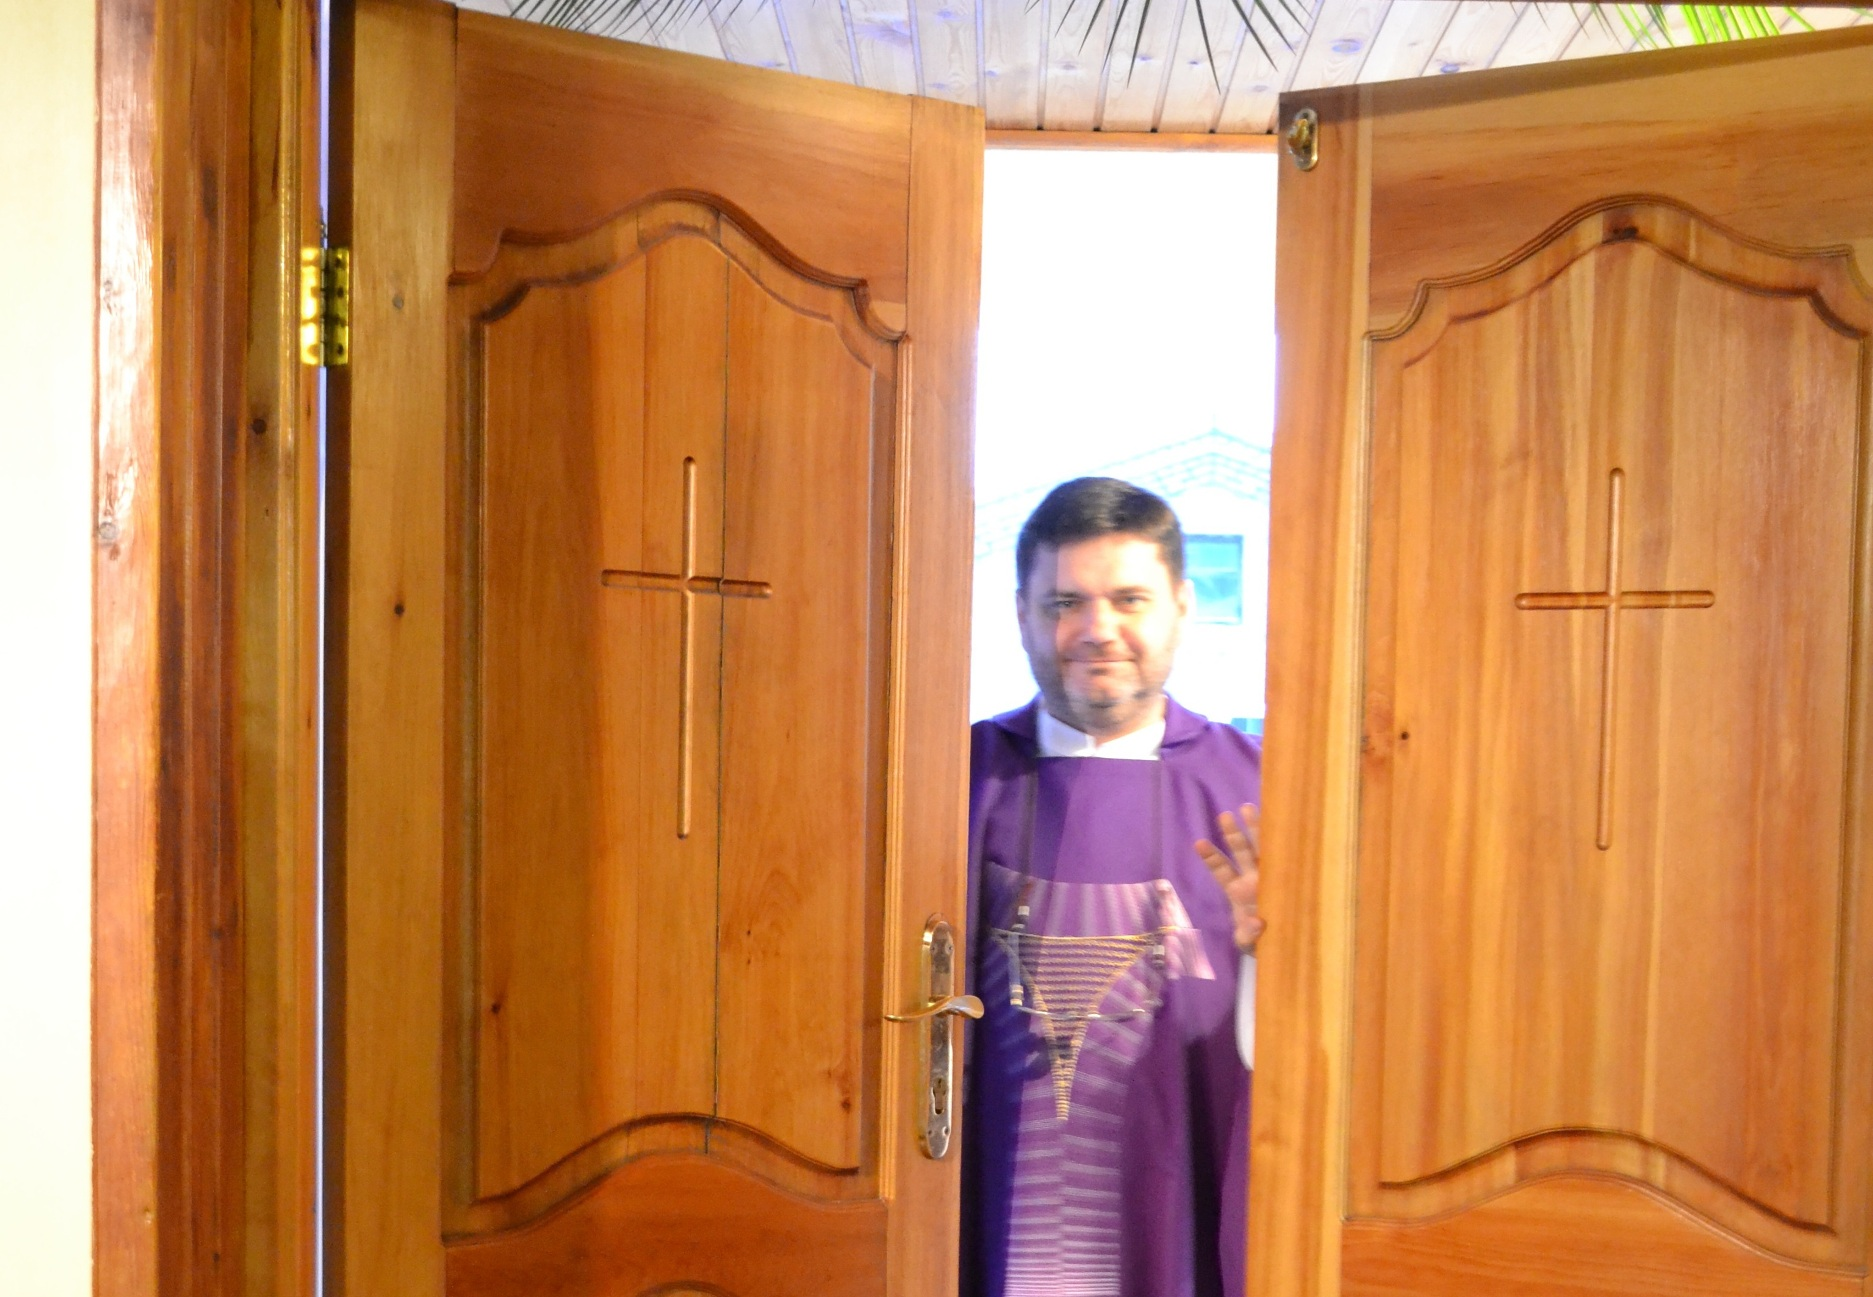 Открытие Святых Врат Милосердия в обители францисканцев (ФОТО)